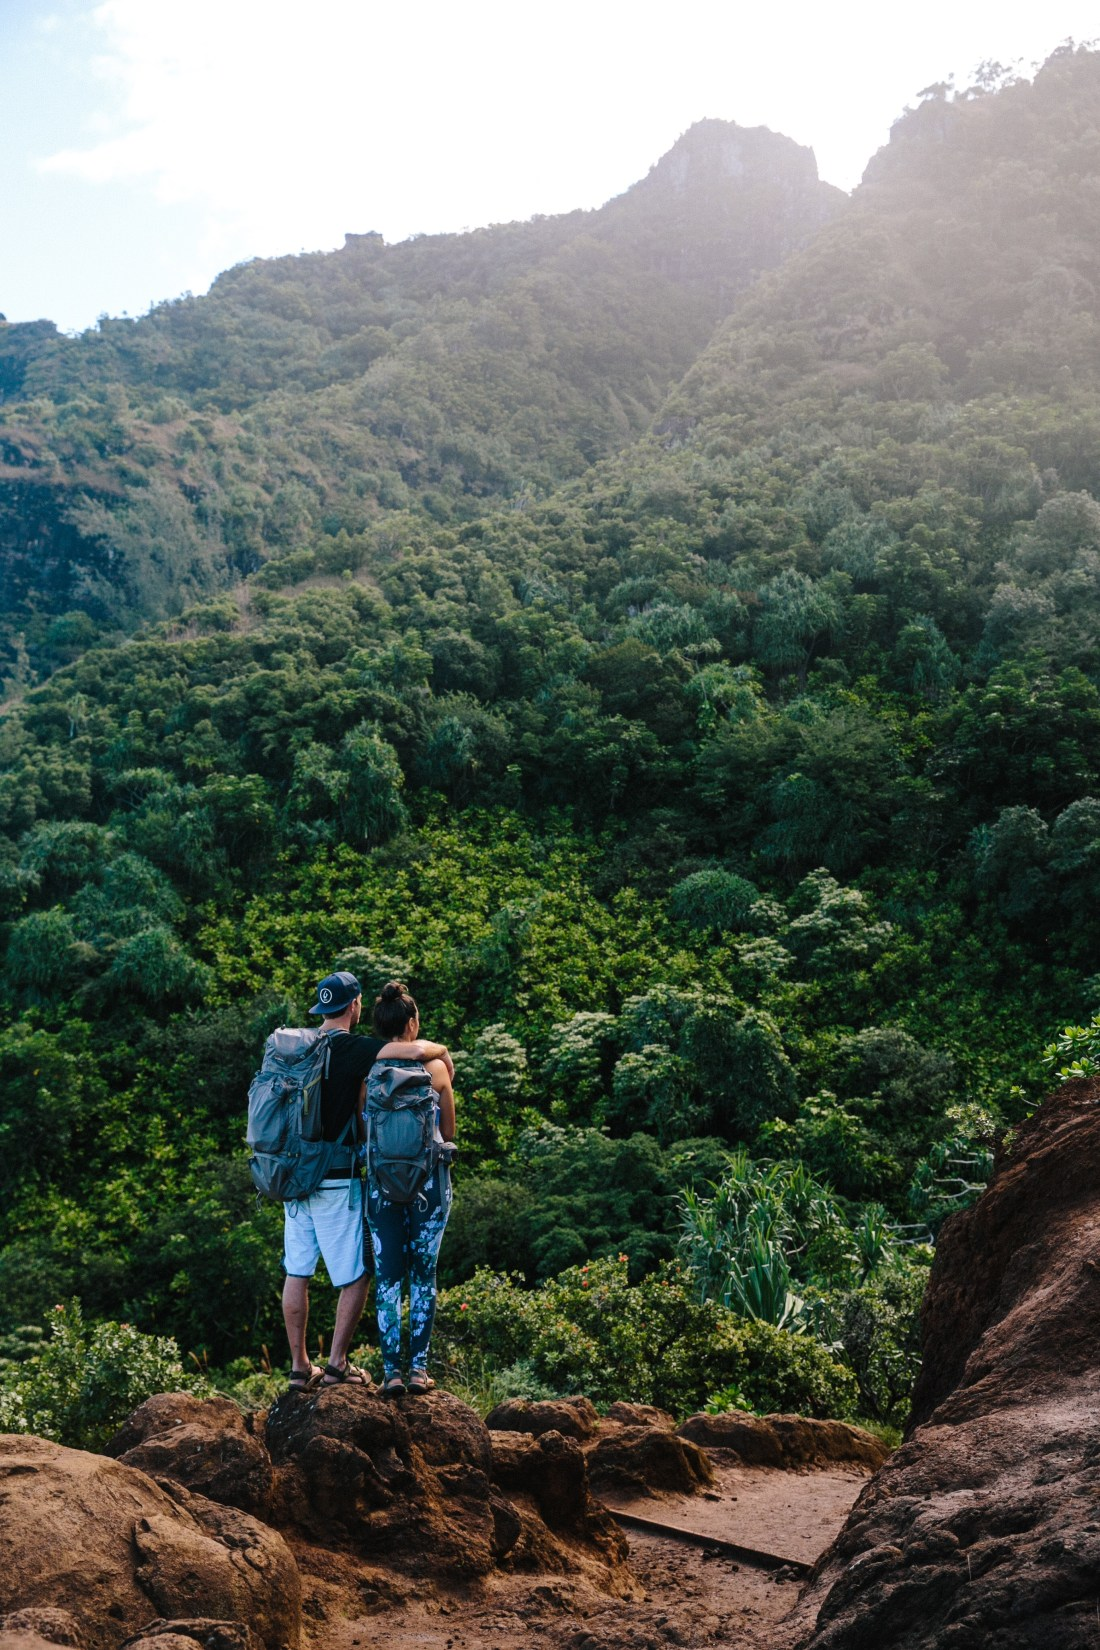 Kalalau Trail Napali Coast, Kauai   Hiking the Na Pali Coast   Travel Guide to Kauai, Hawaii   Travel Tips for Kauai   Packing List for Kauai   Helpful Tips for Traveling to Kauai   Kauai Travel Guide   Hawaii Travel Guide   Why You Should Visit Hawaii   Napali Coast Boat Excursion   Activities To Do in Kauai   Best Vacation Places in the World via @elanaloo + elanaloo.com